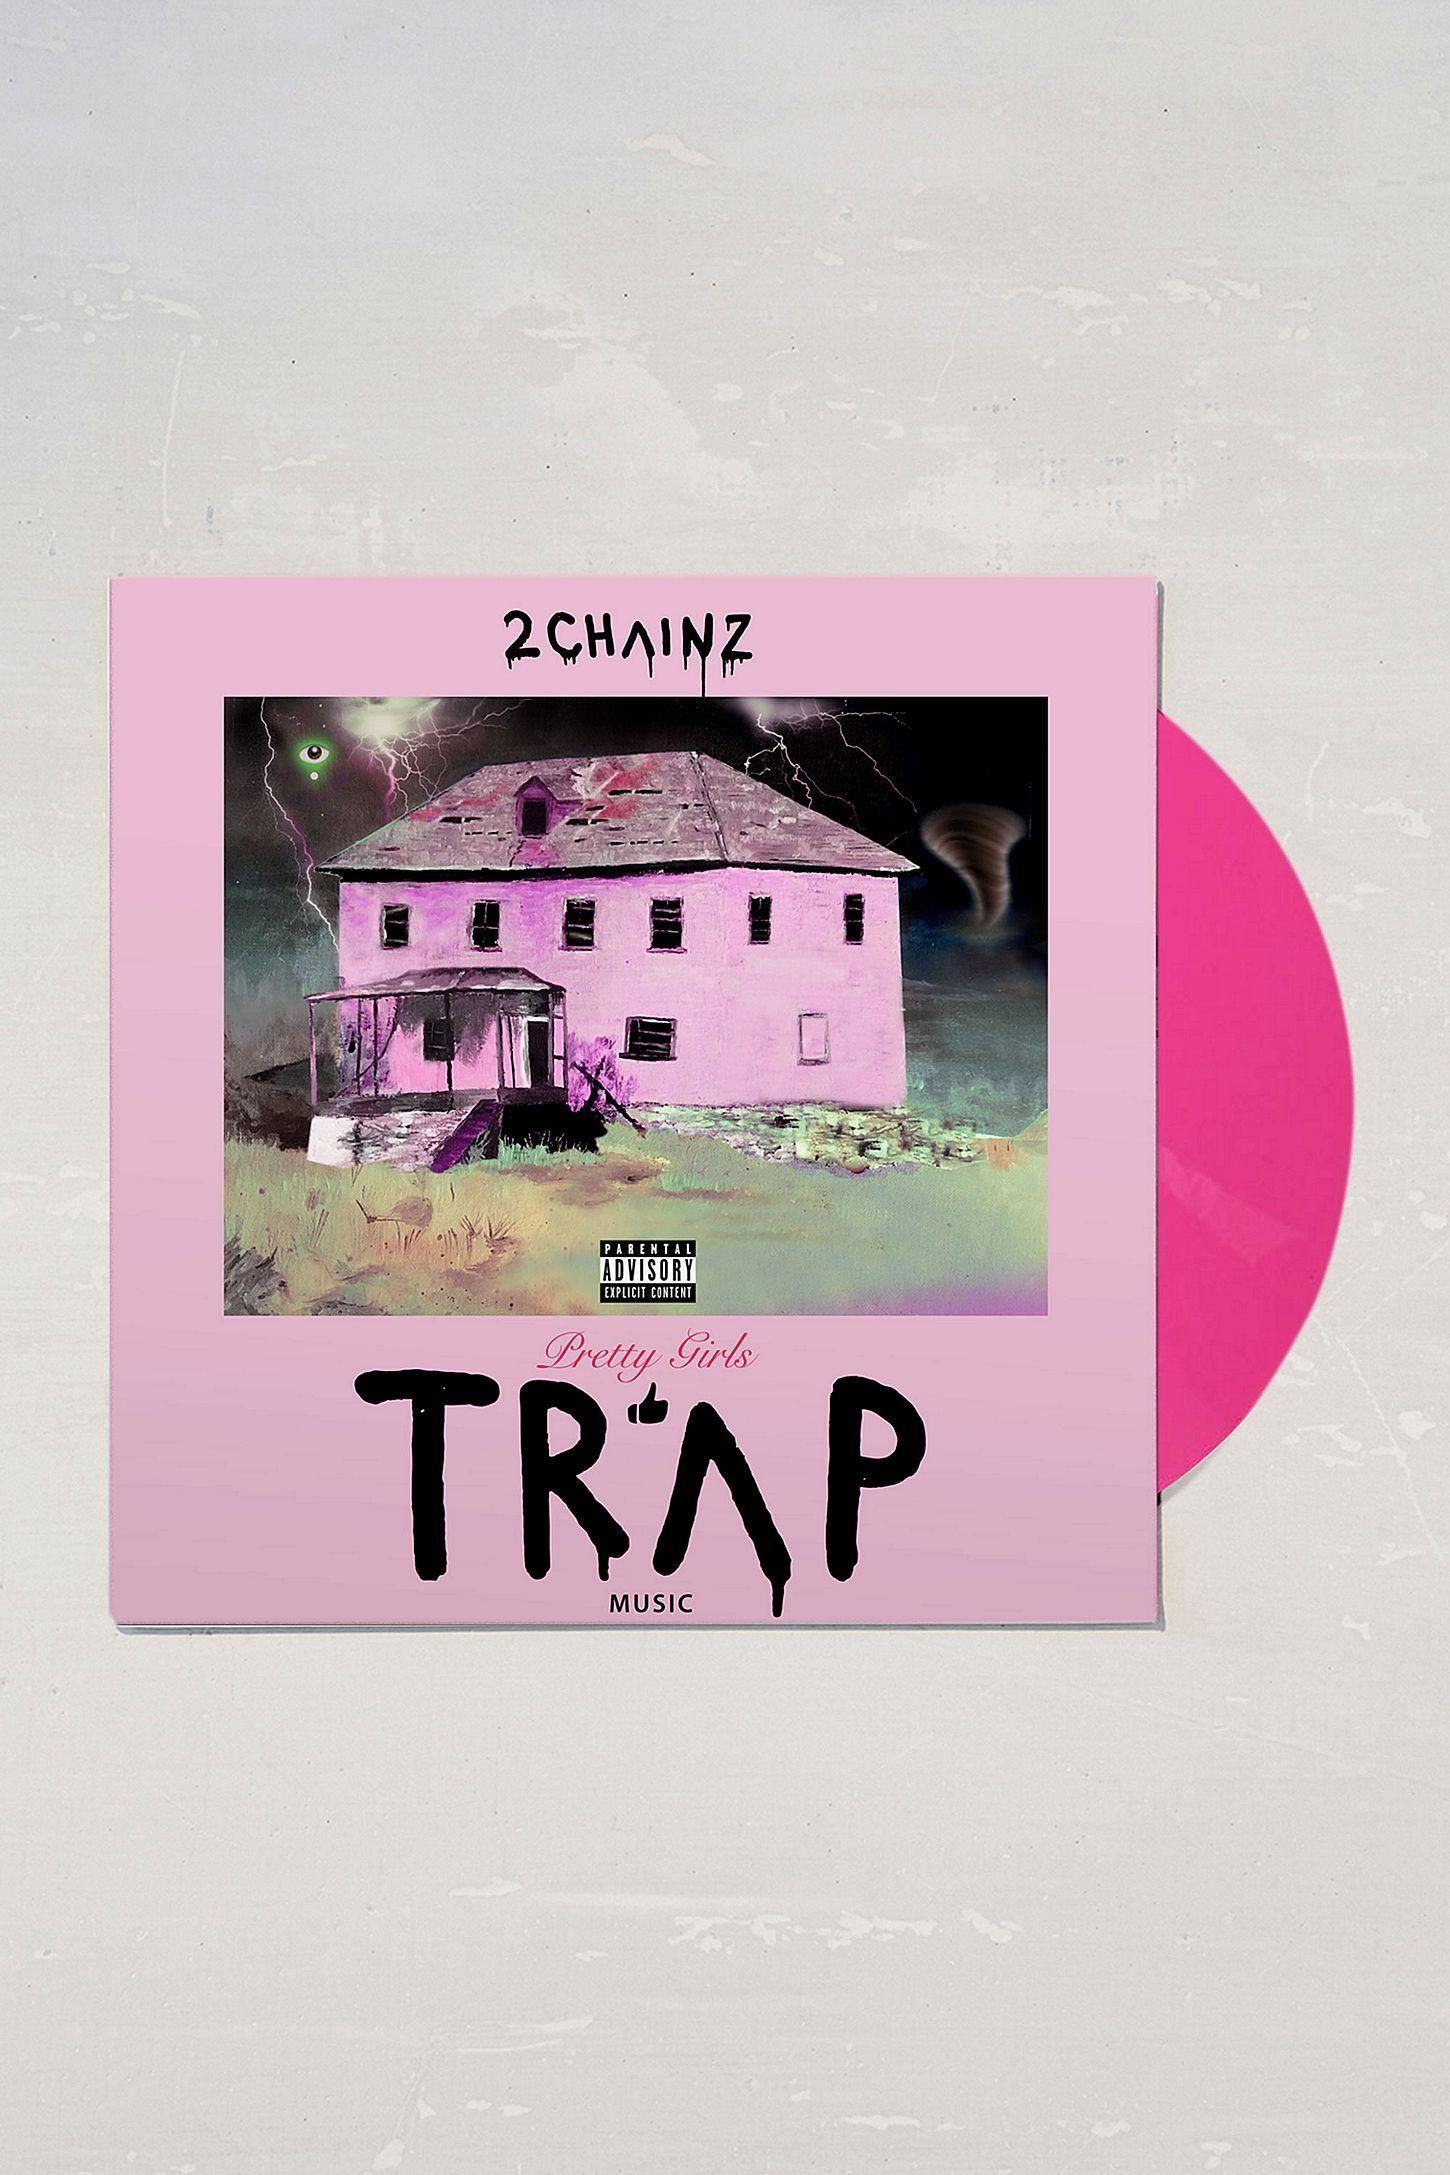 Slide View 1 2 Chainz Pretty Girls Like Trap Music Limited